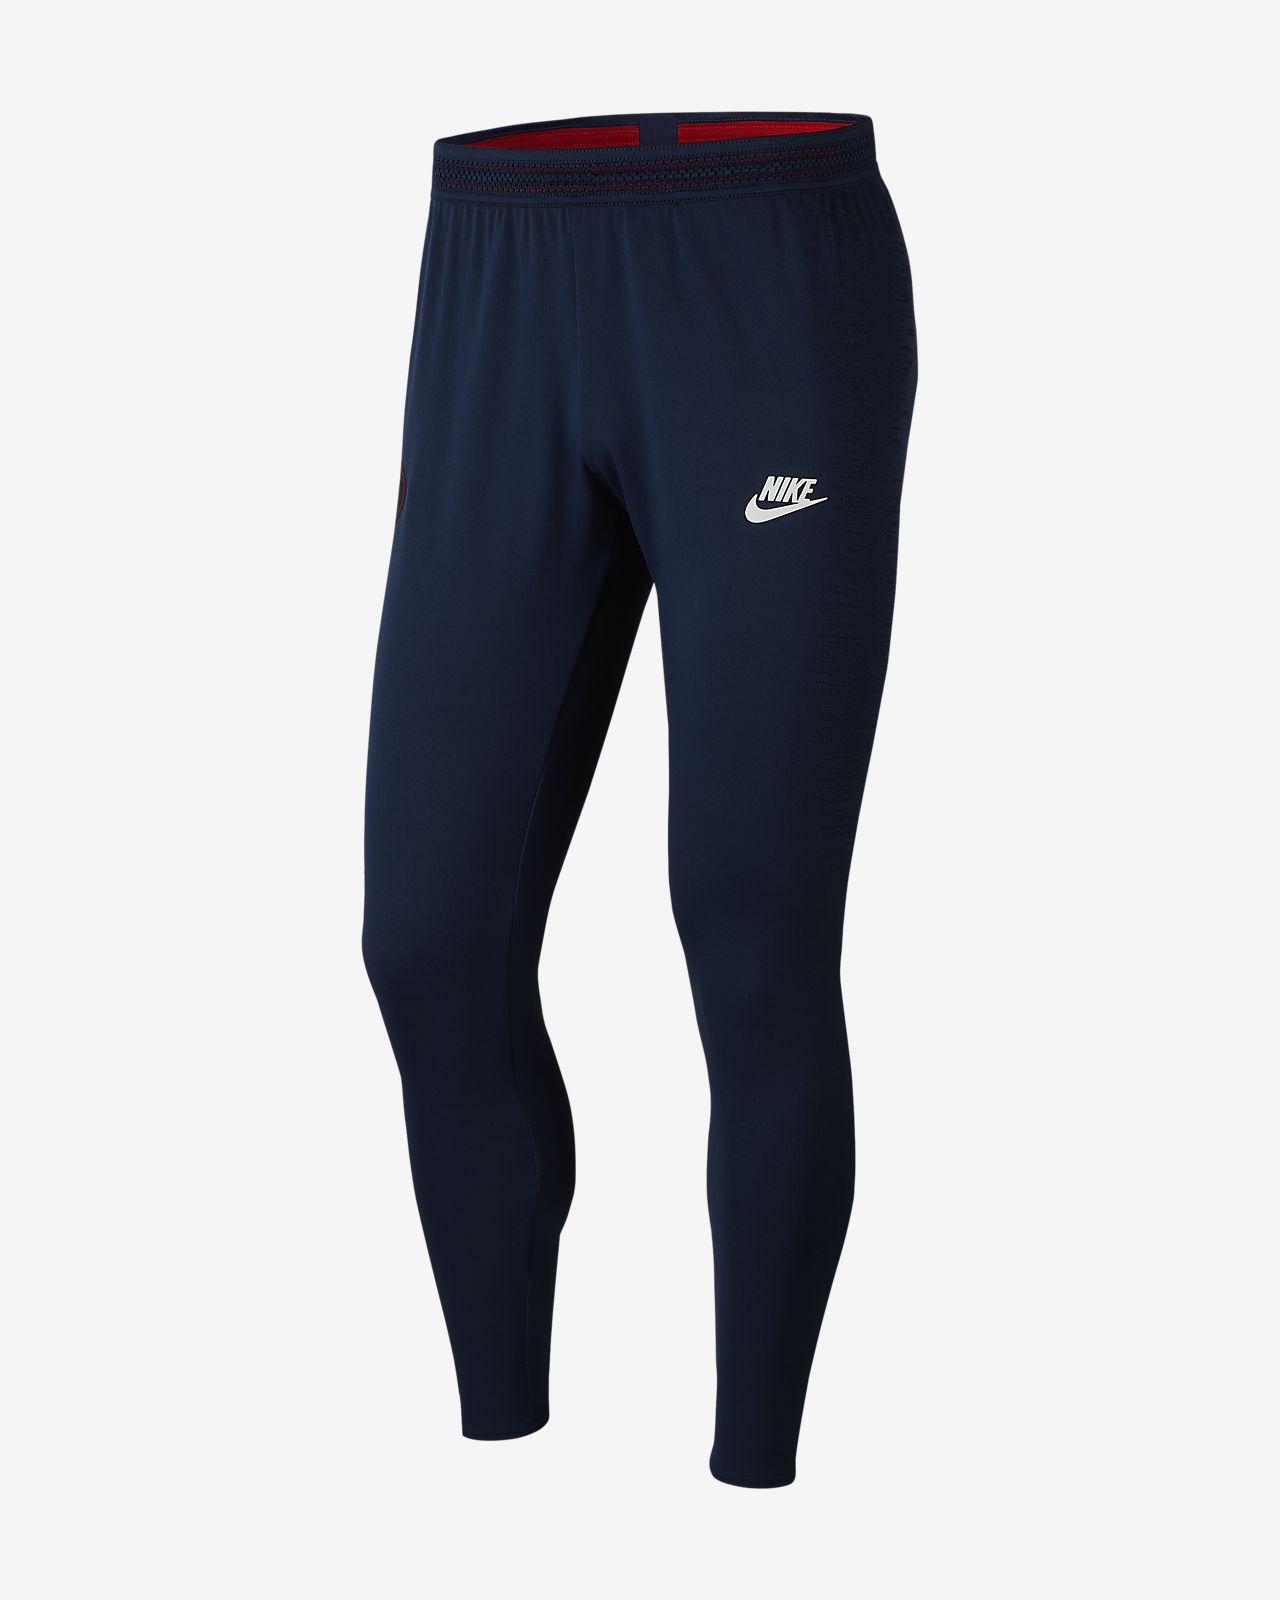 Nike VaporKnit Paris Saint-Germain Strike-fodboldbukser til mænd